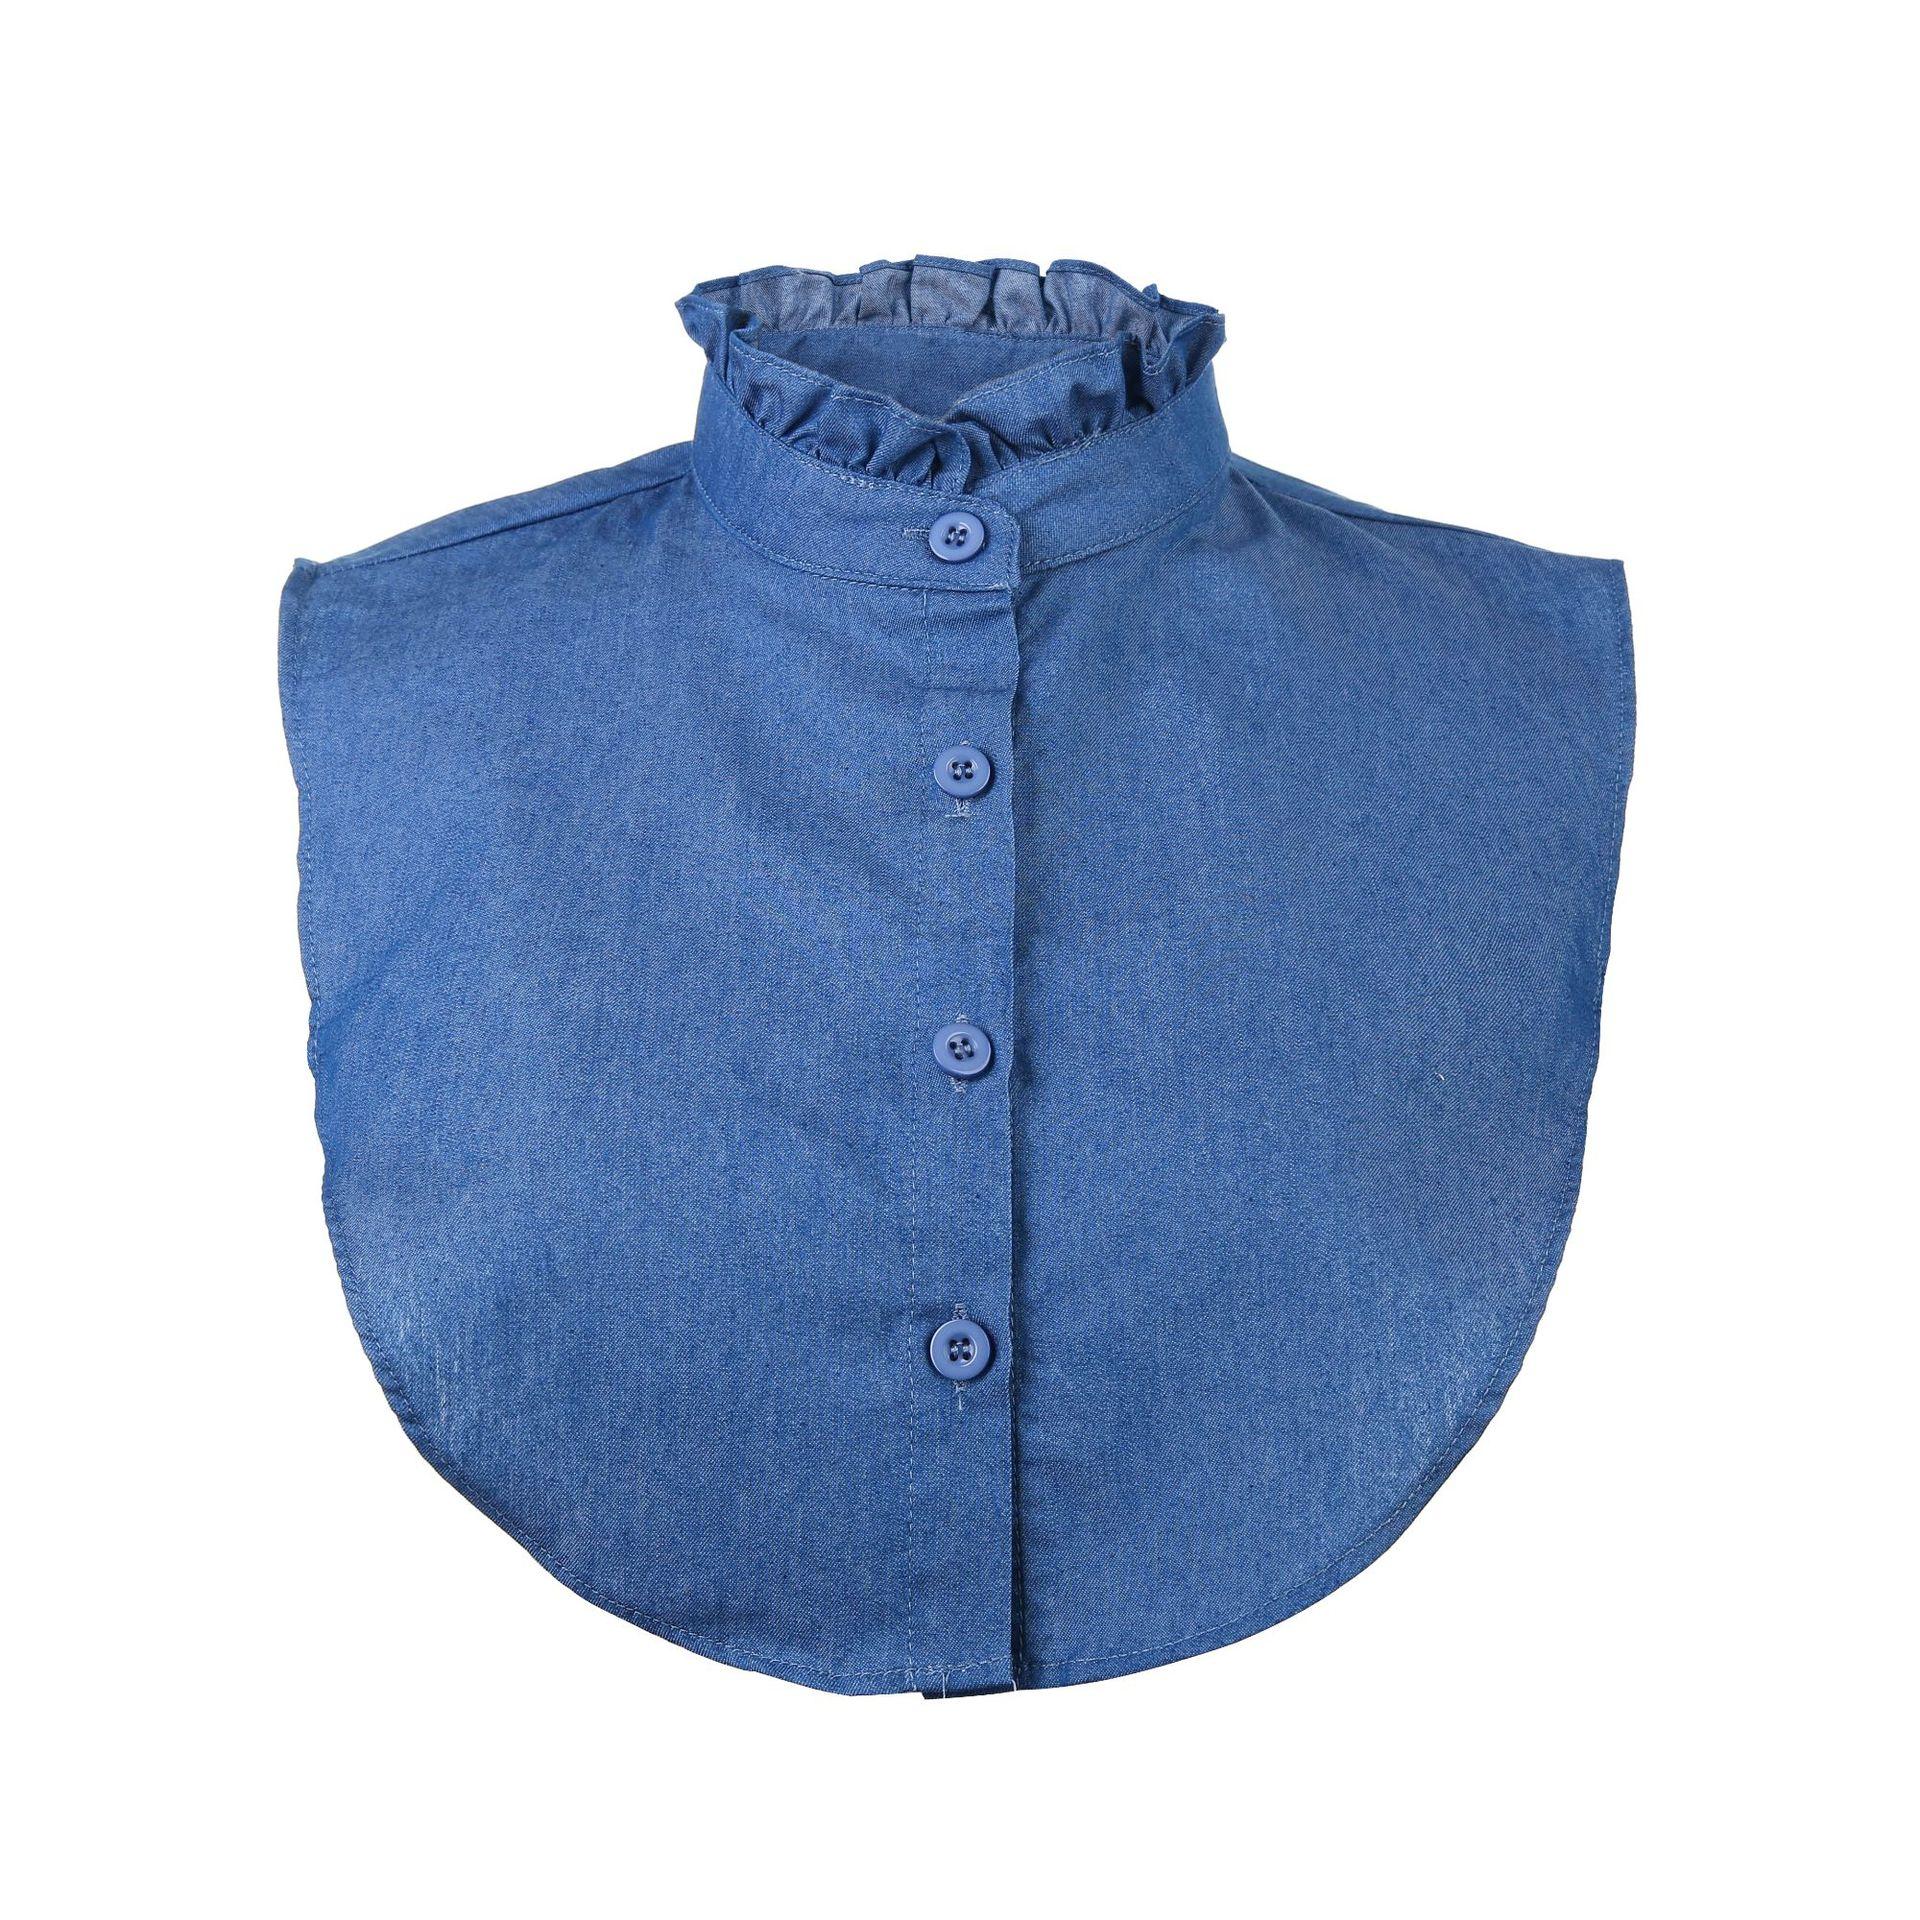 Denim Blue Underwear All Seasons Short Clothes Underwear False Collar Suit Collar Tree Fungus-like Lacework Decorative Collar